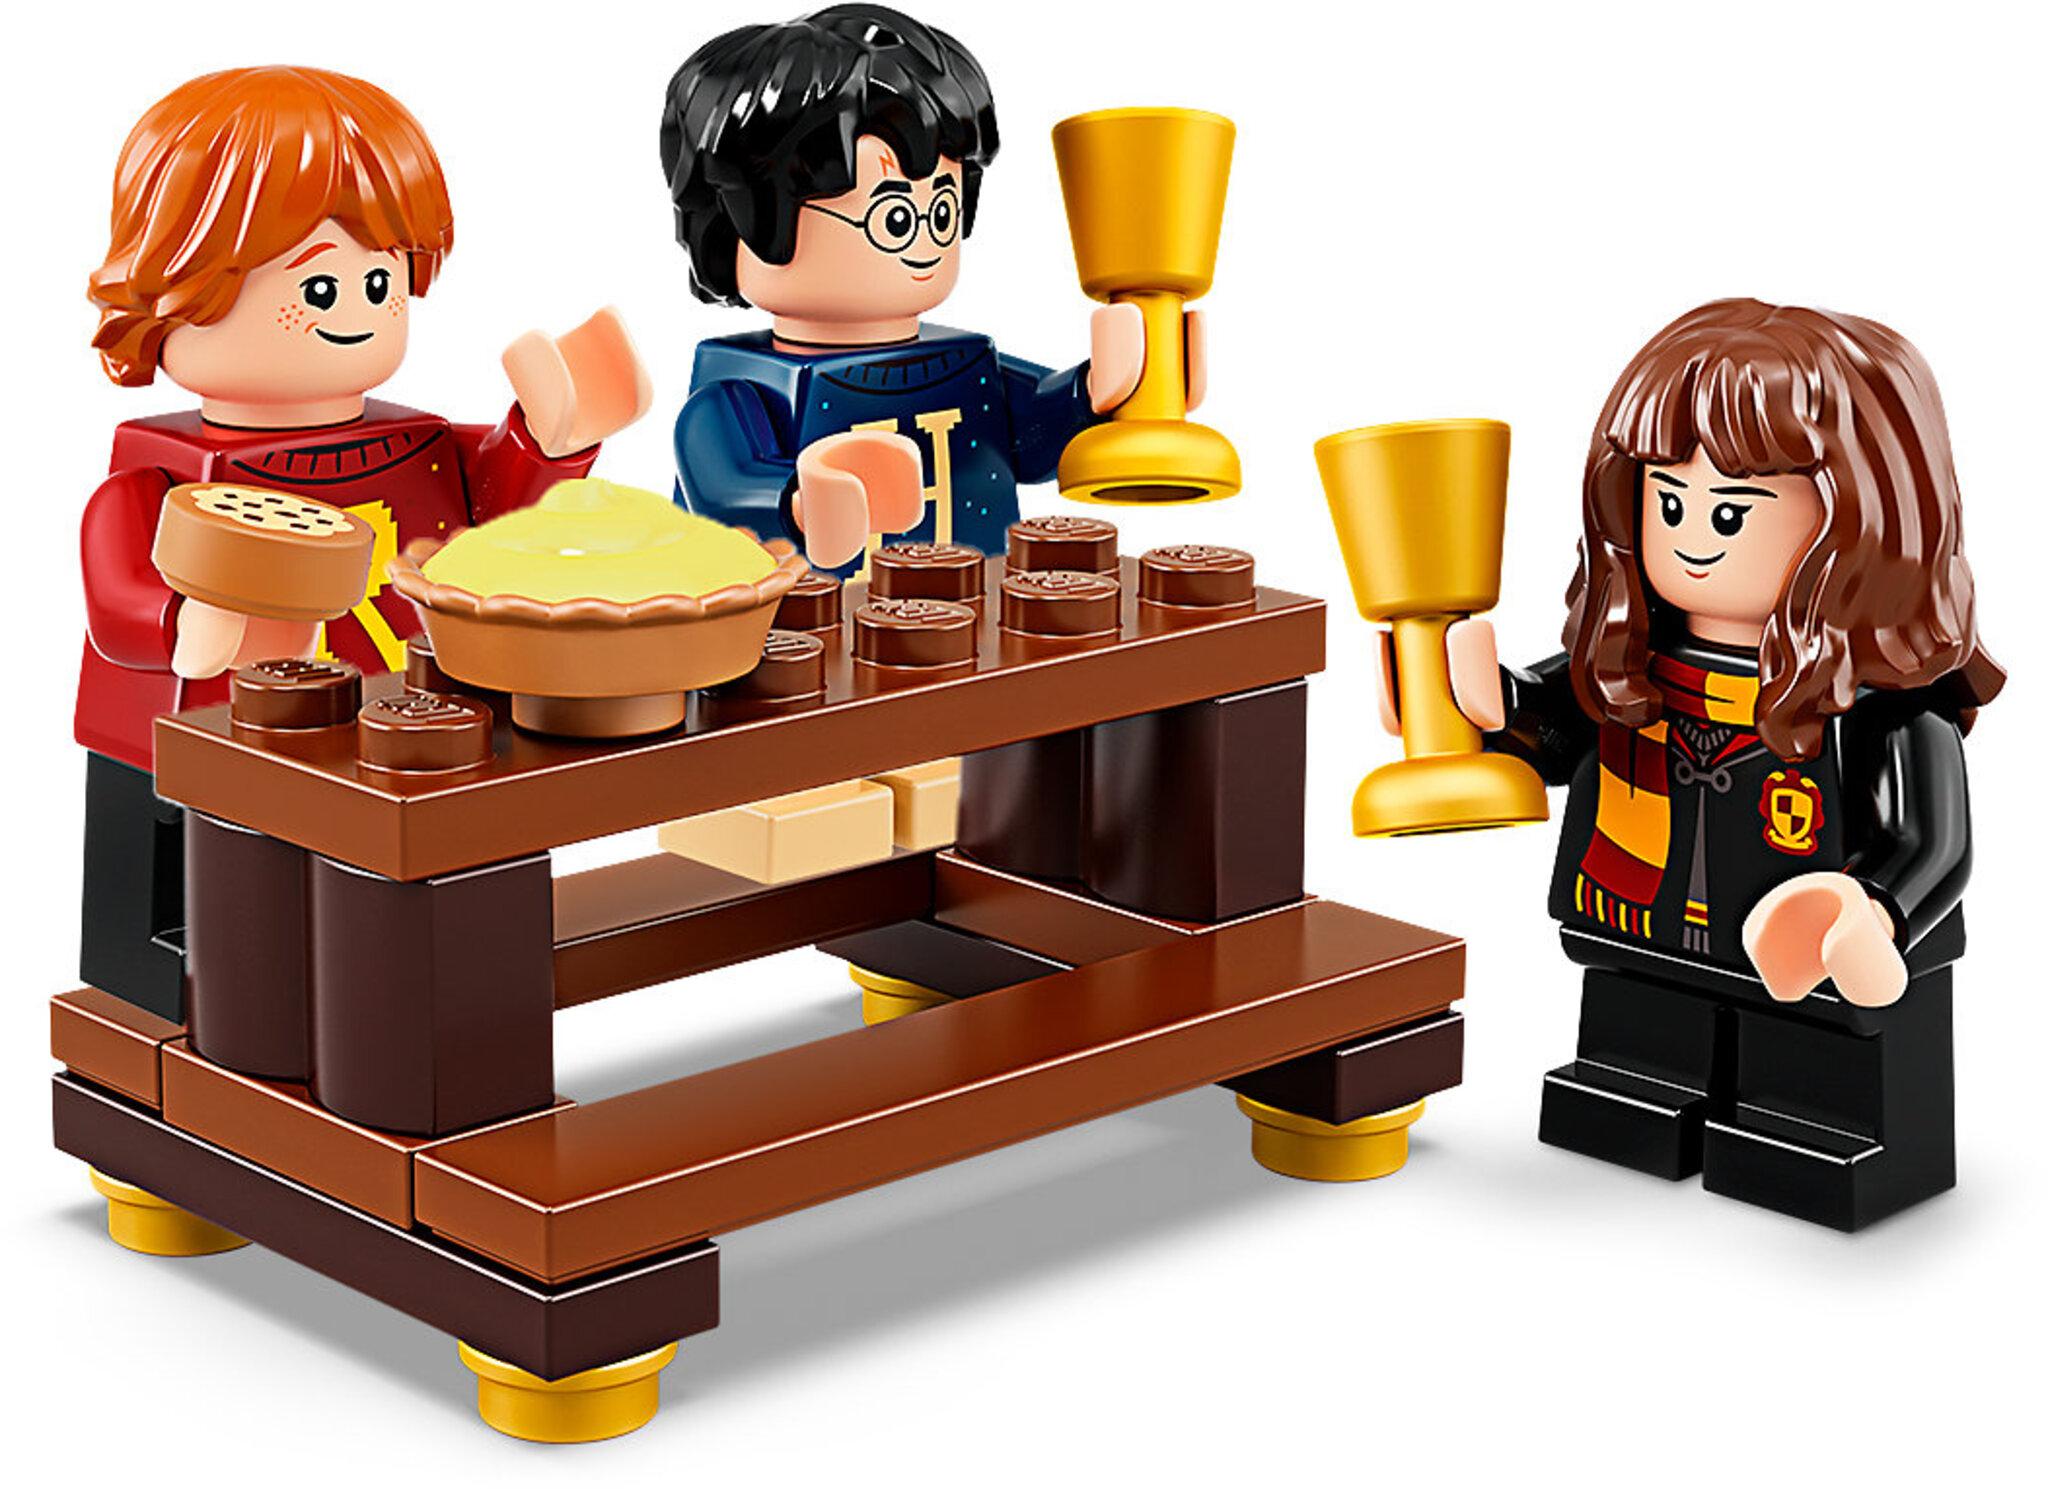 Calendario Dellavvento Harry Potter 2019.Lego Harry Potter 75964 Calendario Dell Avvento Lego Harry Potter